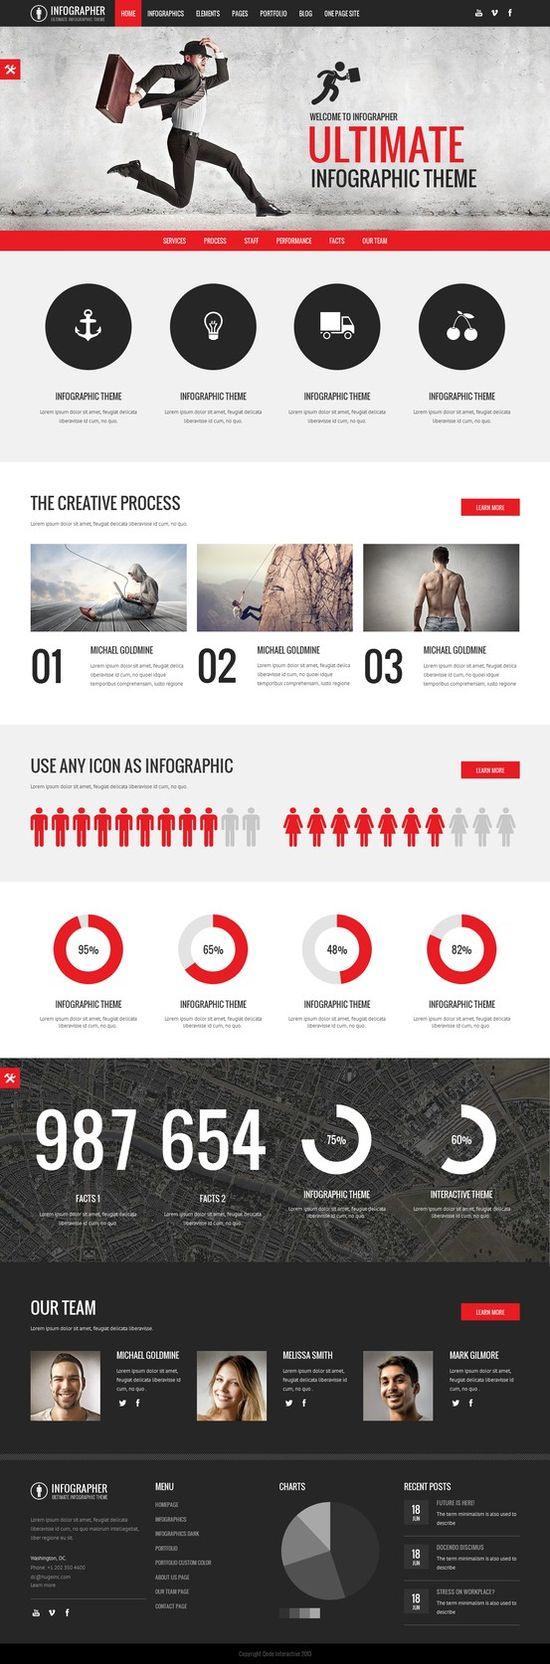 Infographer - Multi-Purpose Infographic Theme themeforest.net/... #web #design #wordpress